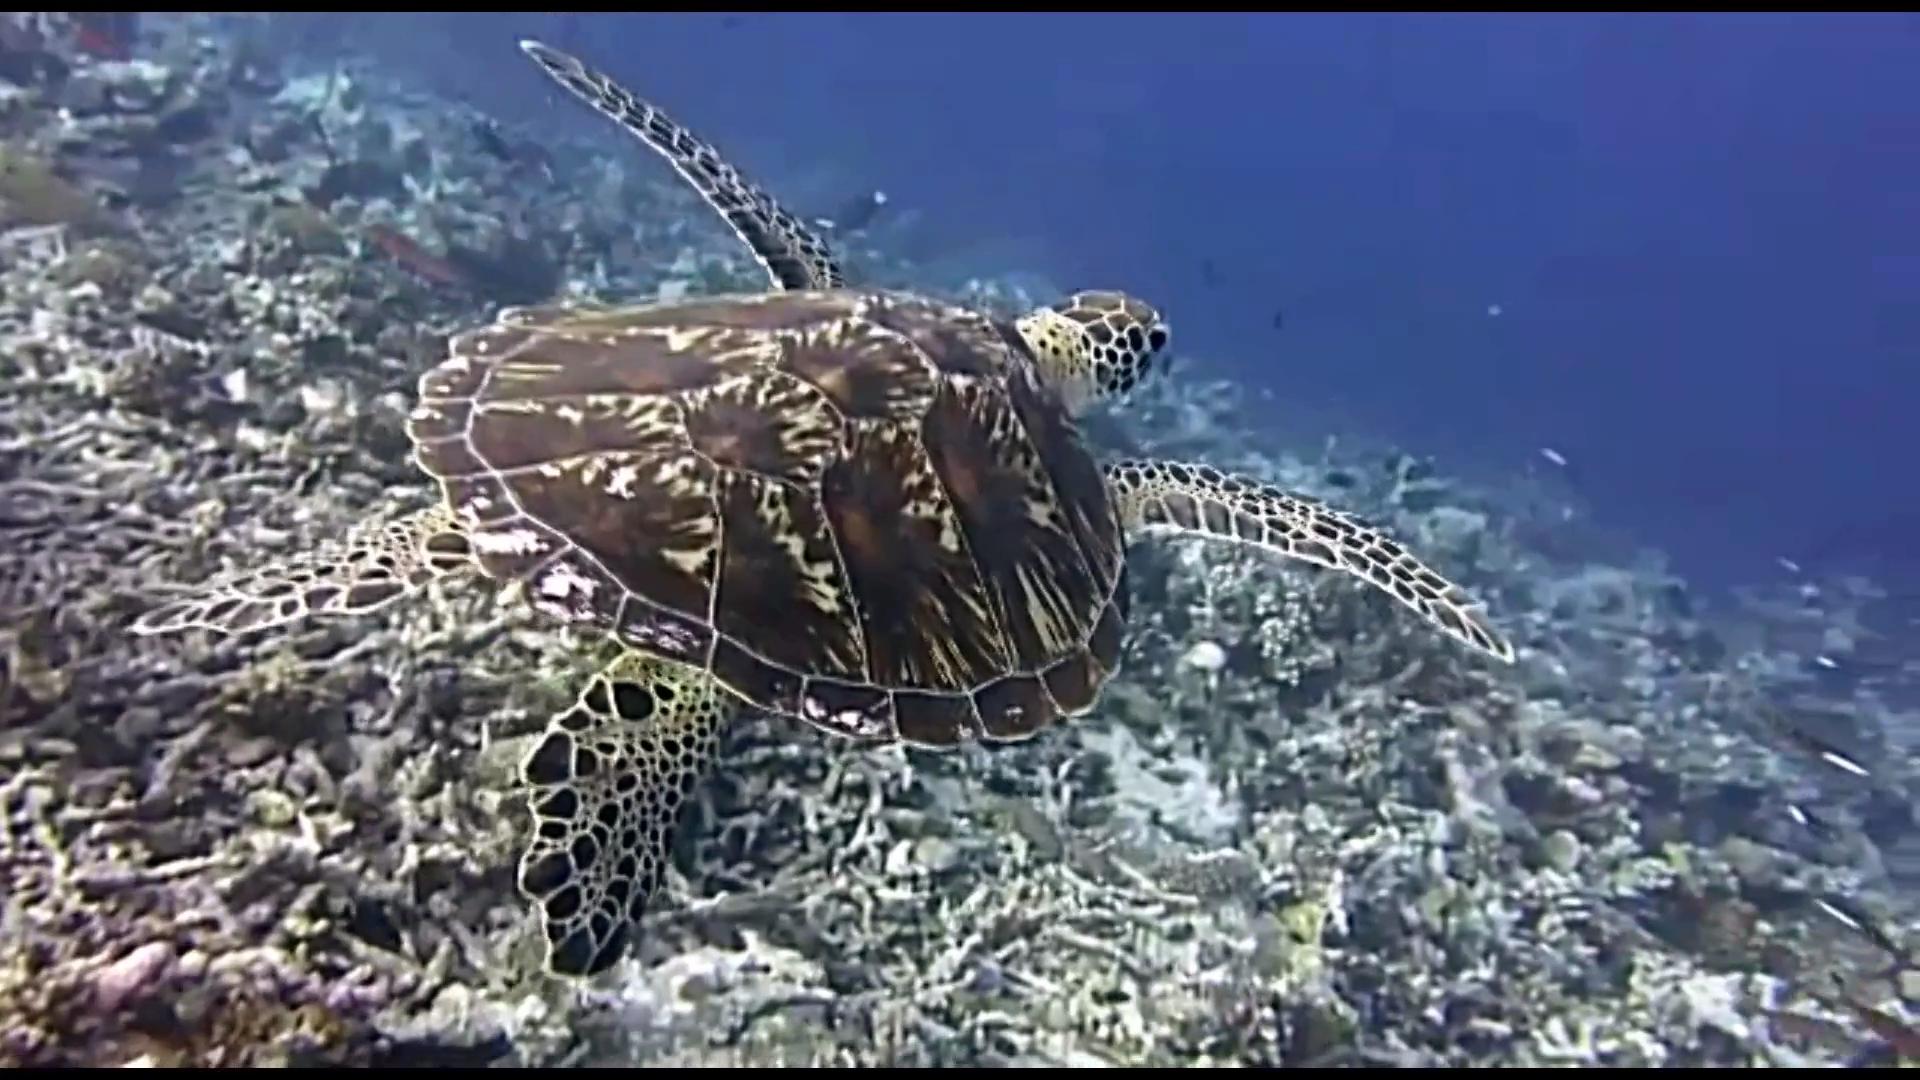 La Tartaruga marina Caretta caretta - The Loggerhead sea Turtle - intotheblue.it